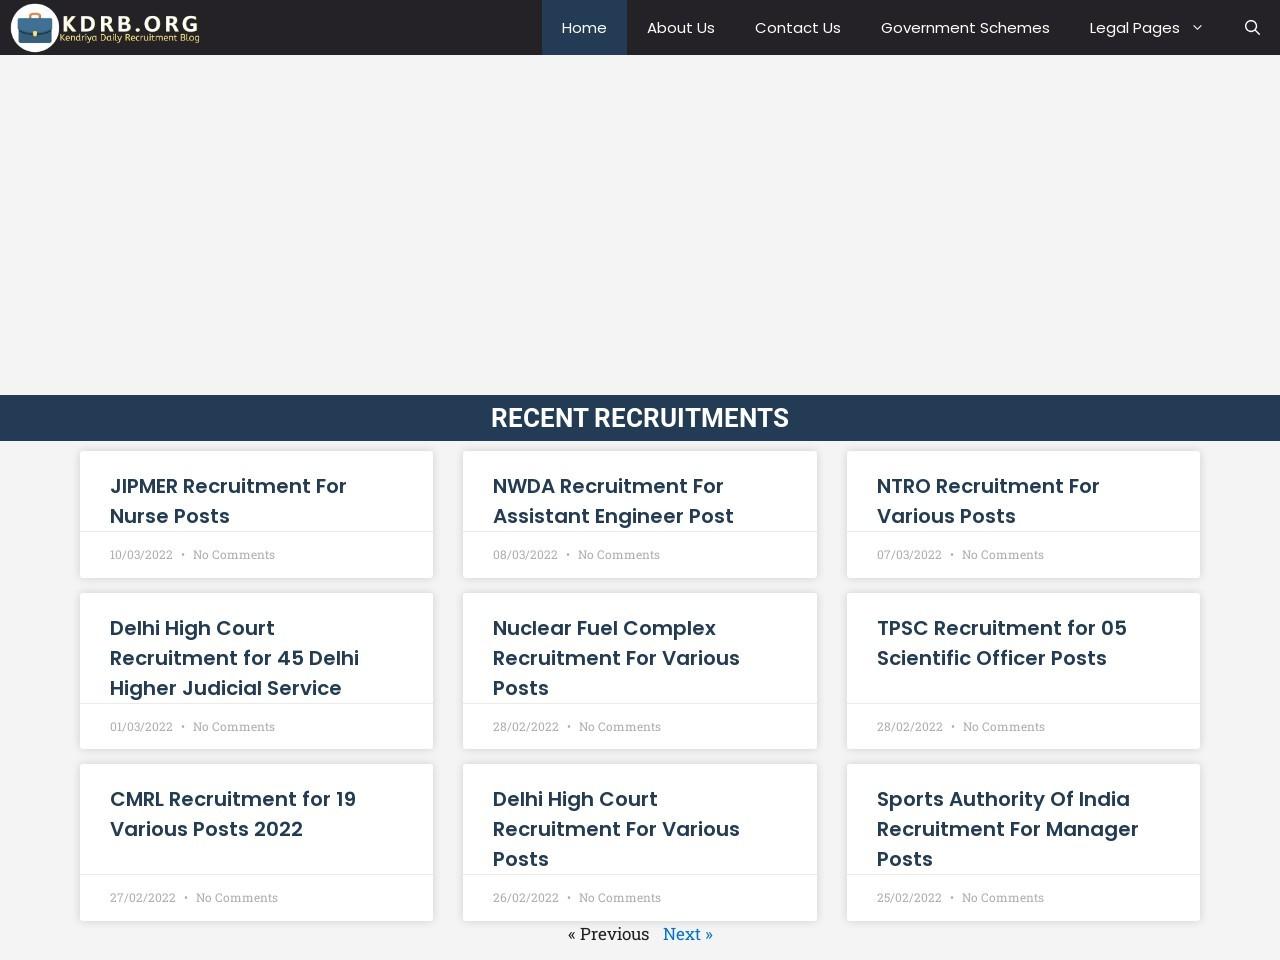 BCCI Recruitment – BCCI Recruitment For Various Posts 2021